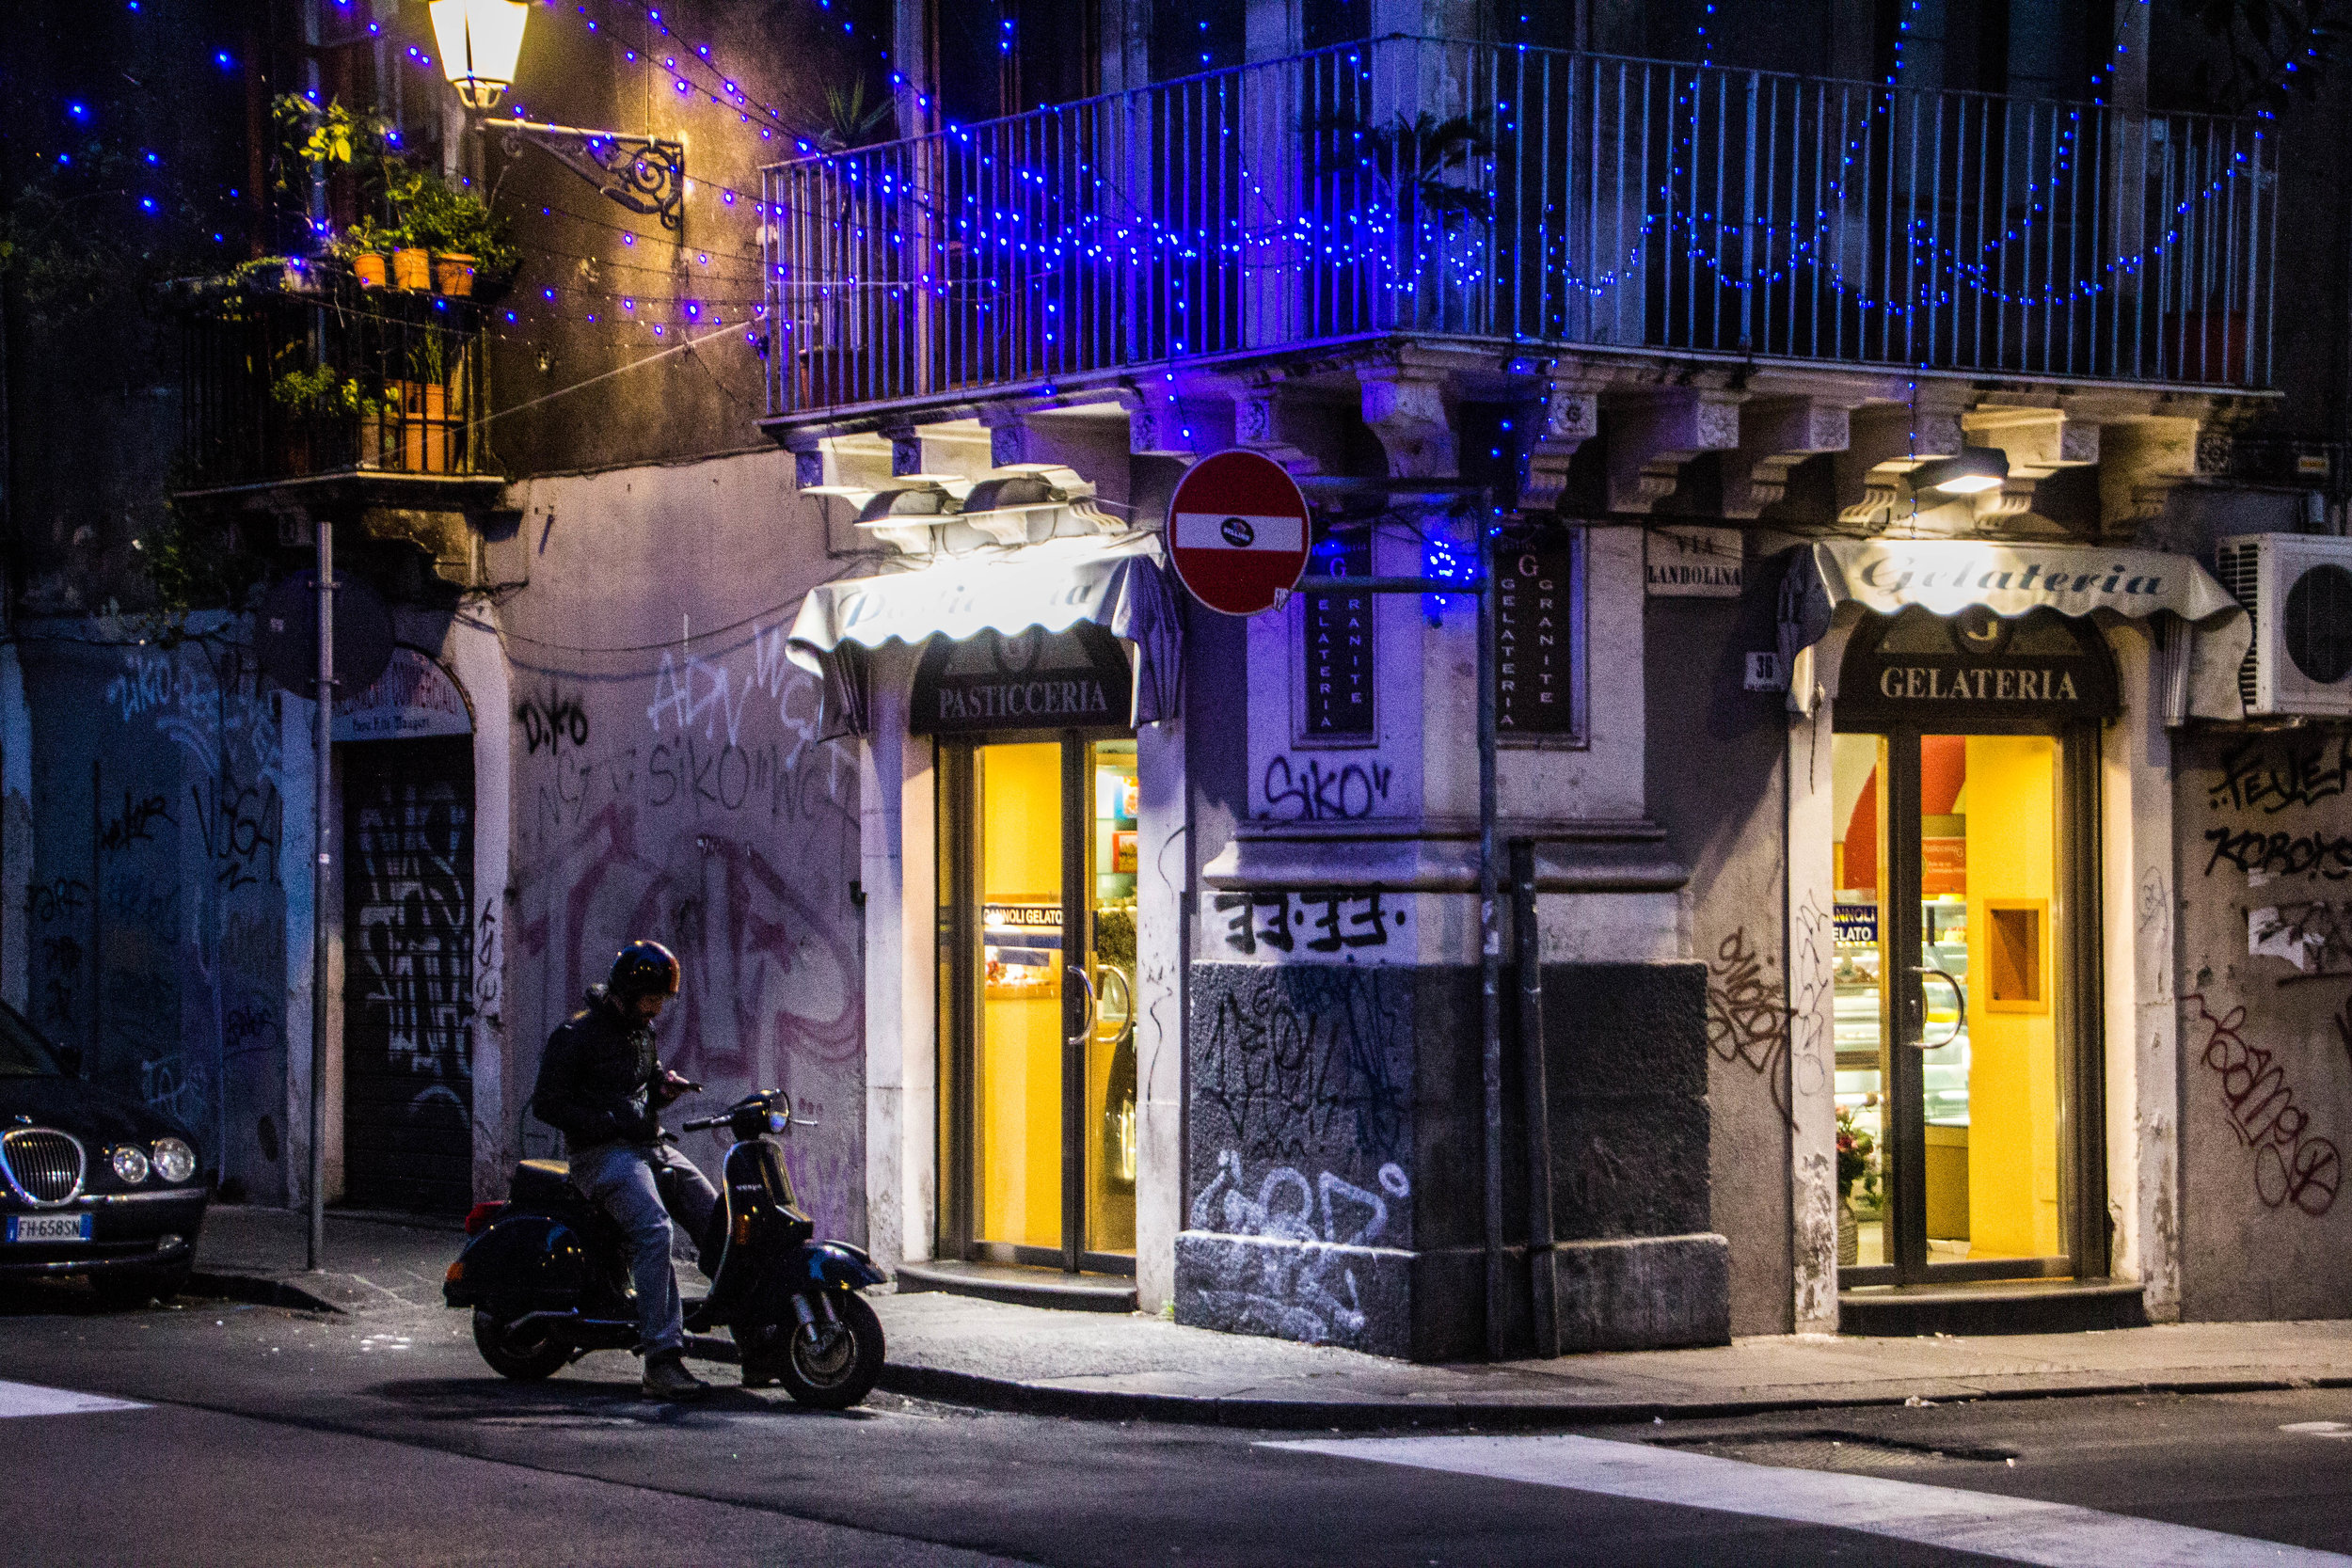 streets-catania-sicily-sicilia-44.jpg